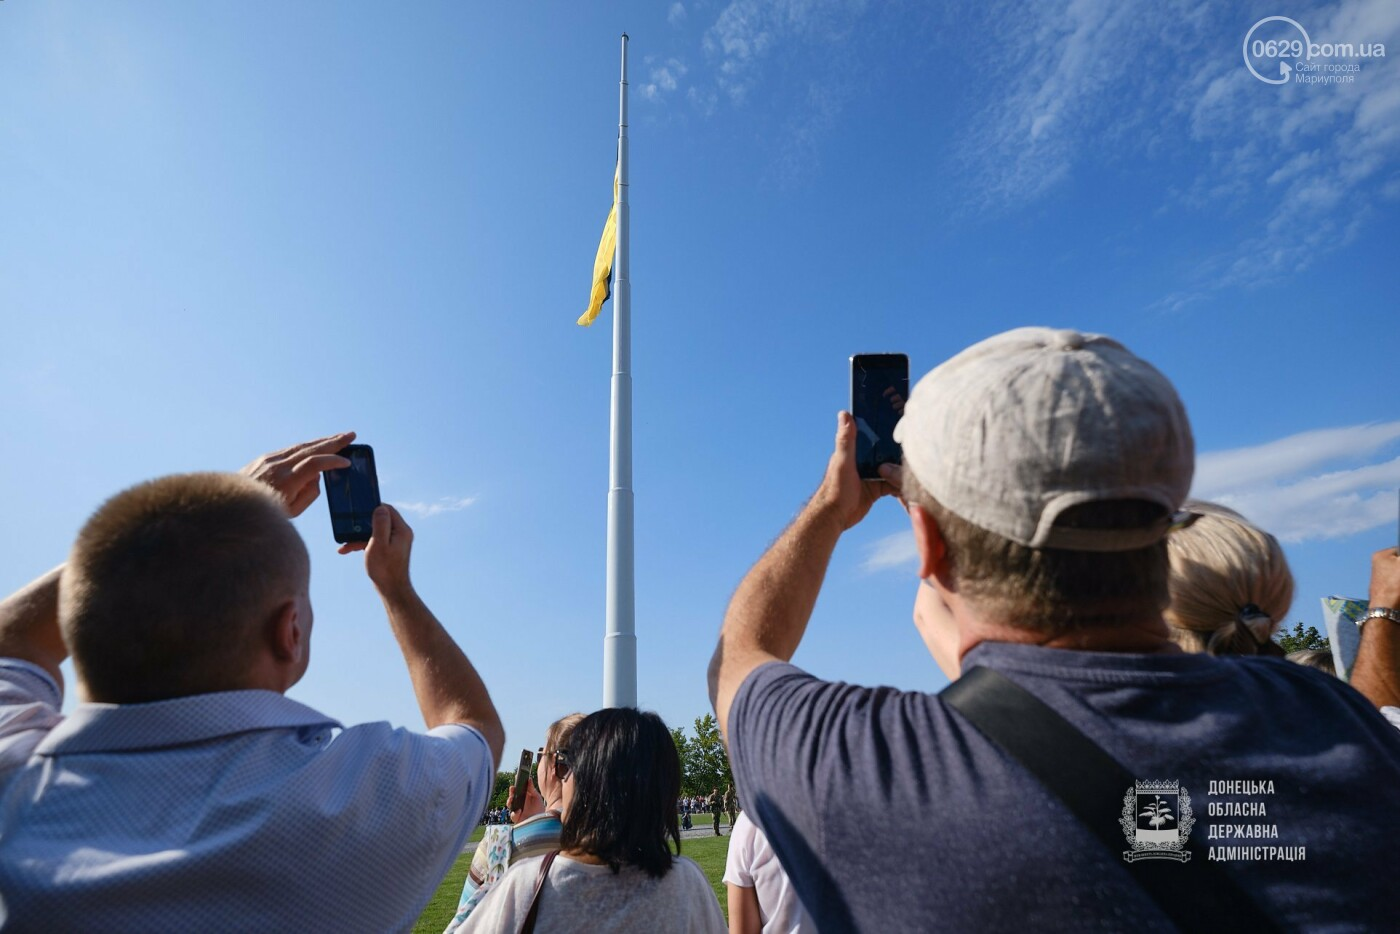 В Донецкой области подняли флаг Украины на 80 метров, - ФОТО, фото-2